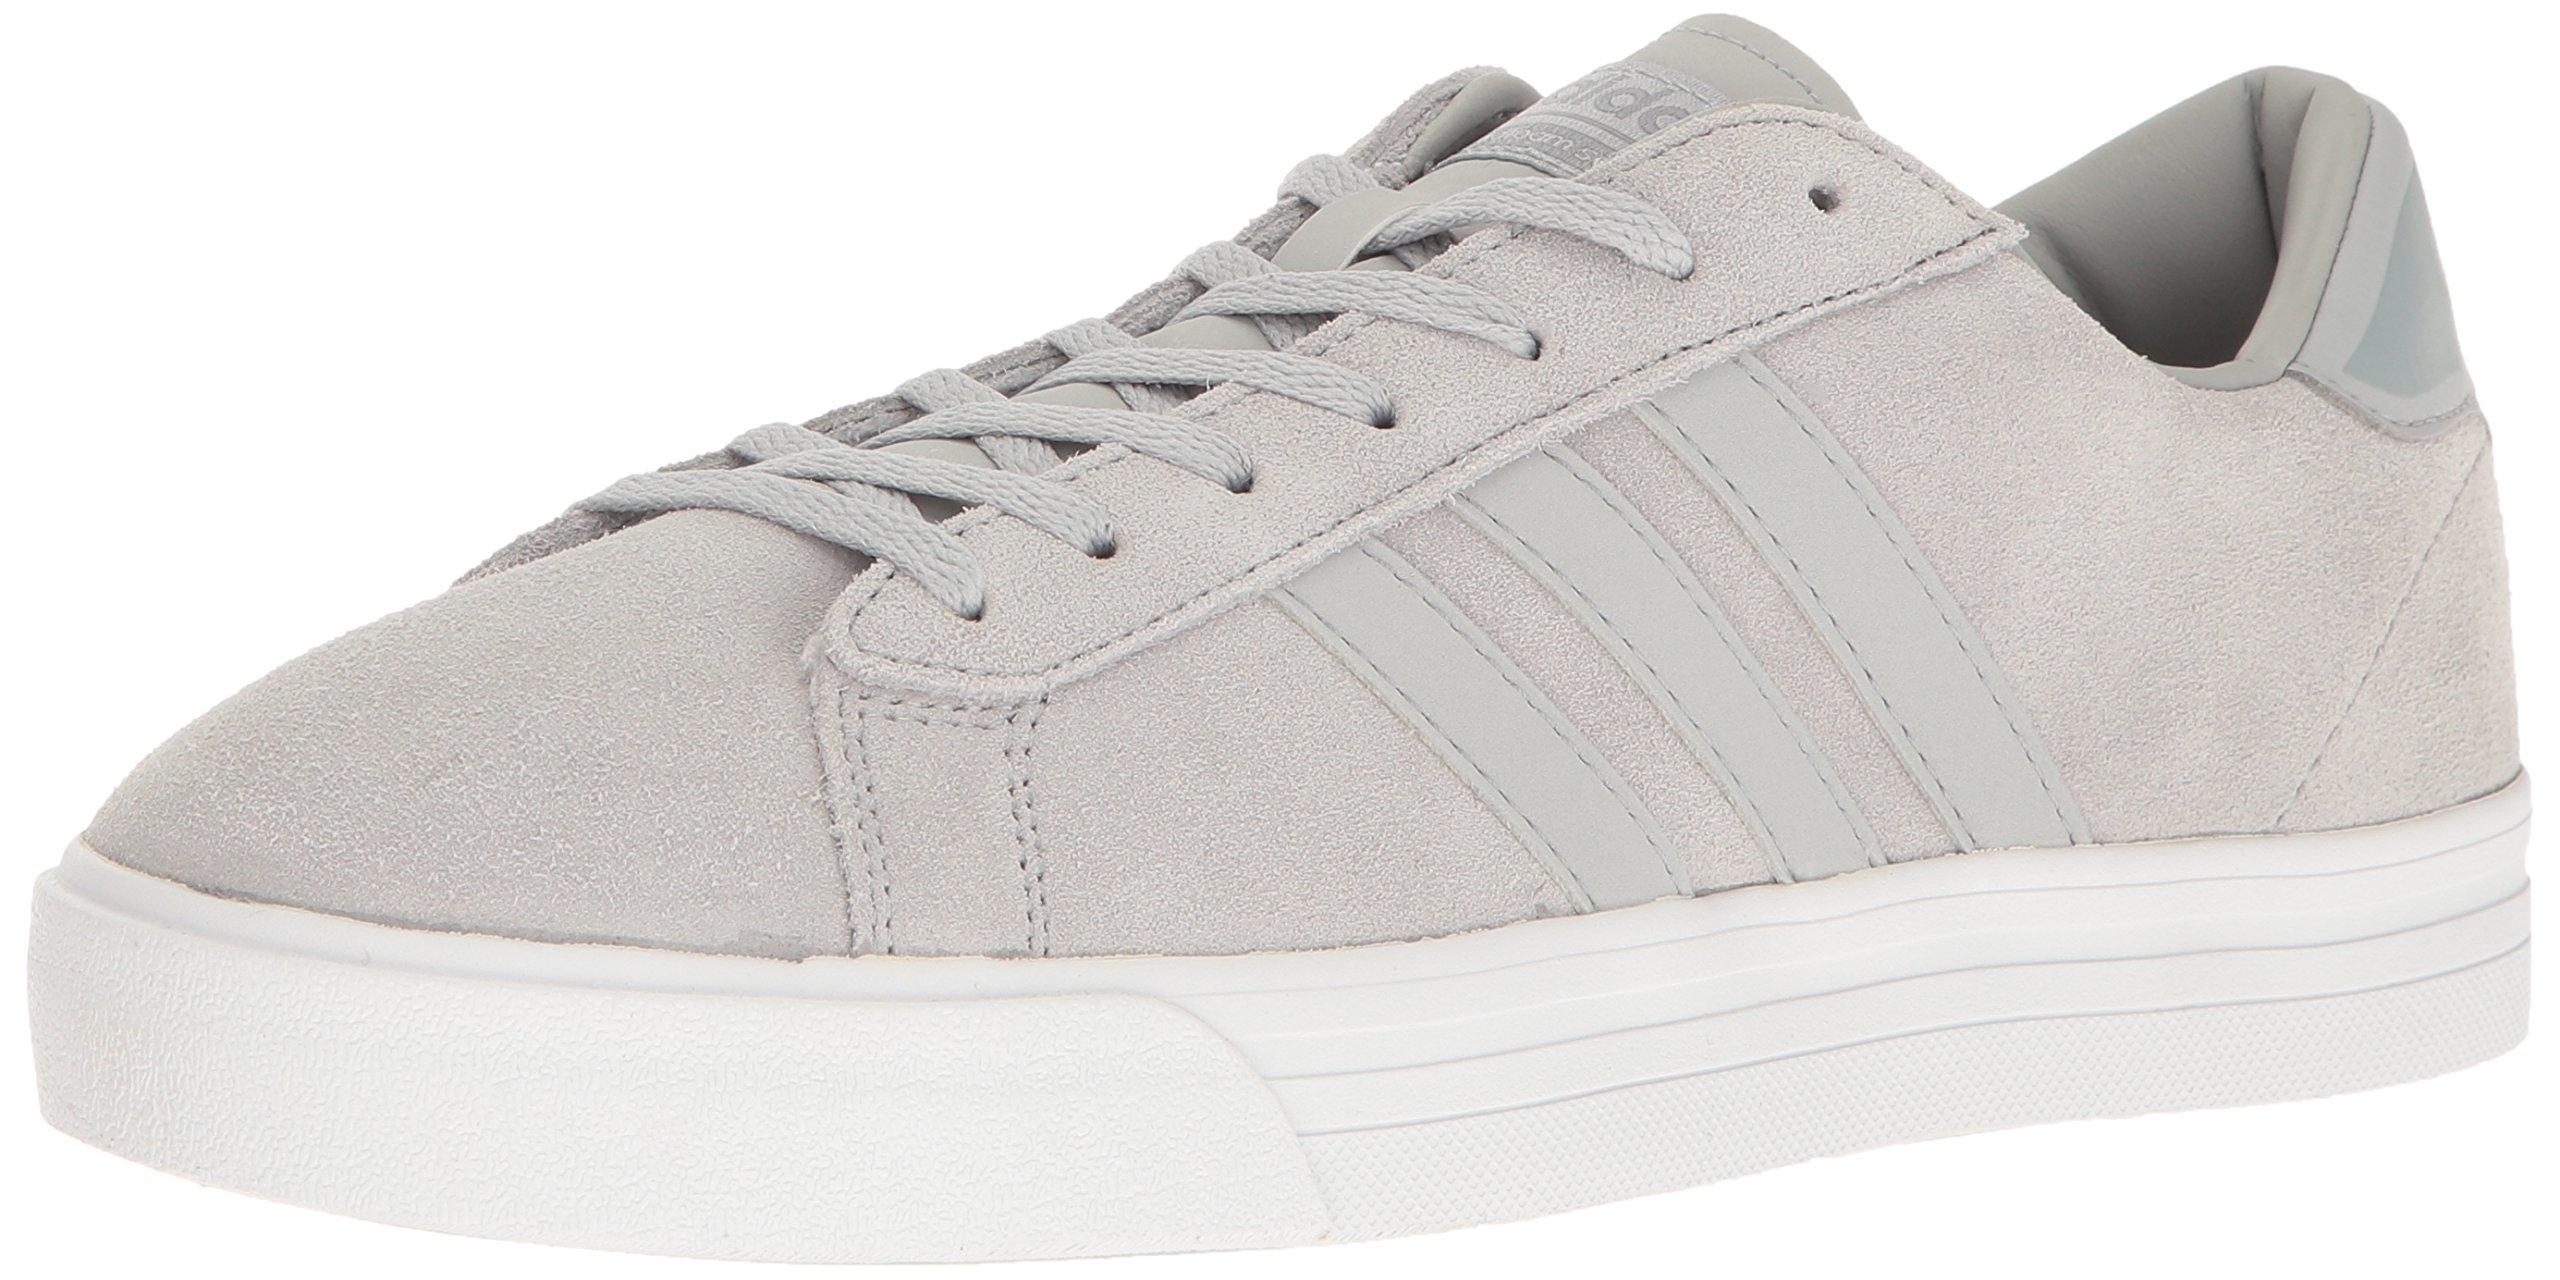 4c03e1faab2 Galleon - Adidas Men s Cloudfoam Super Daily Sneakers